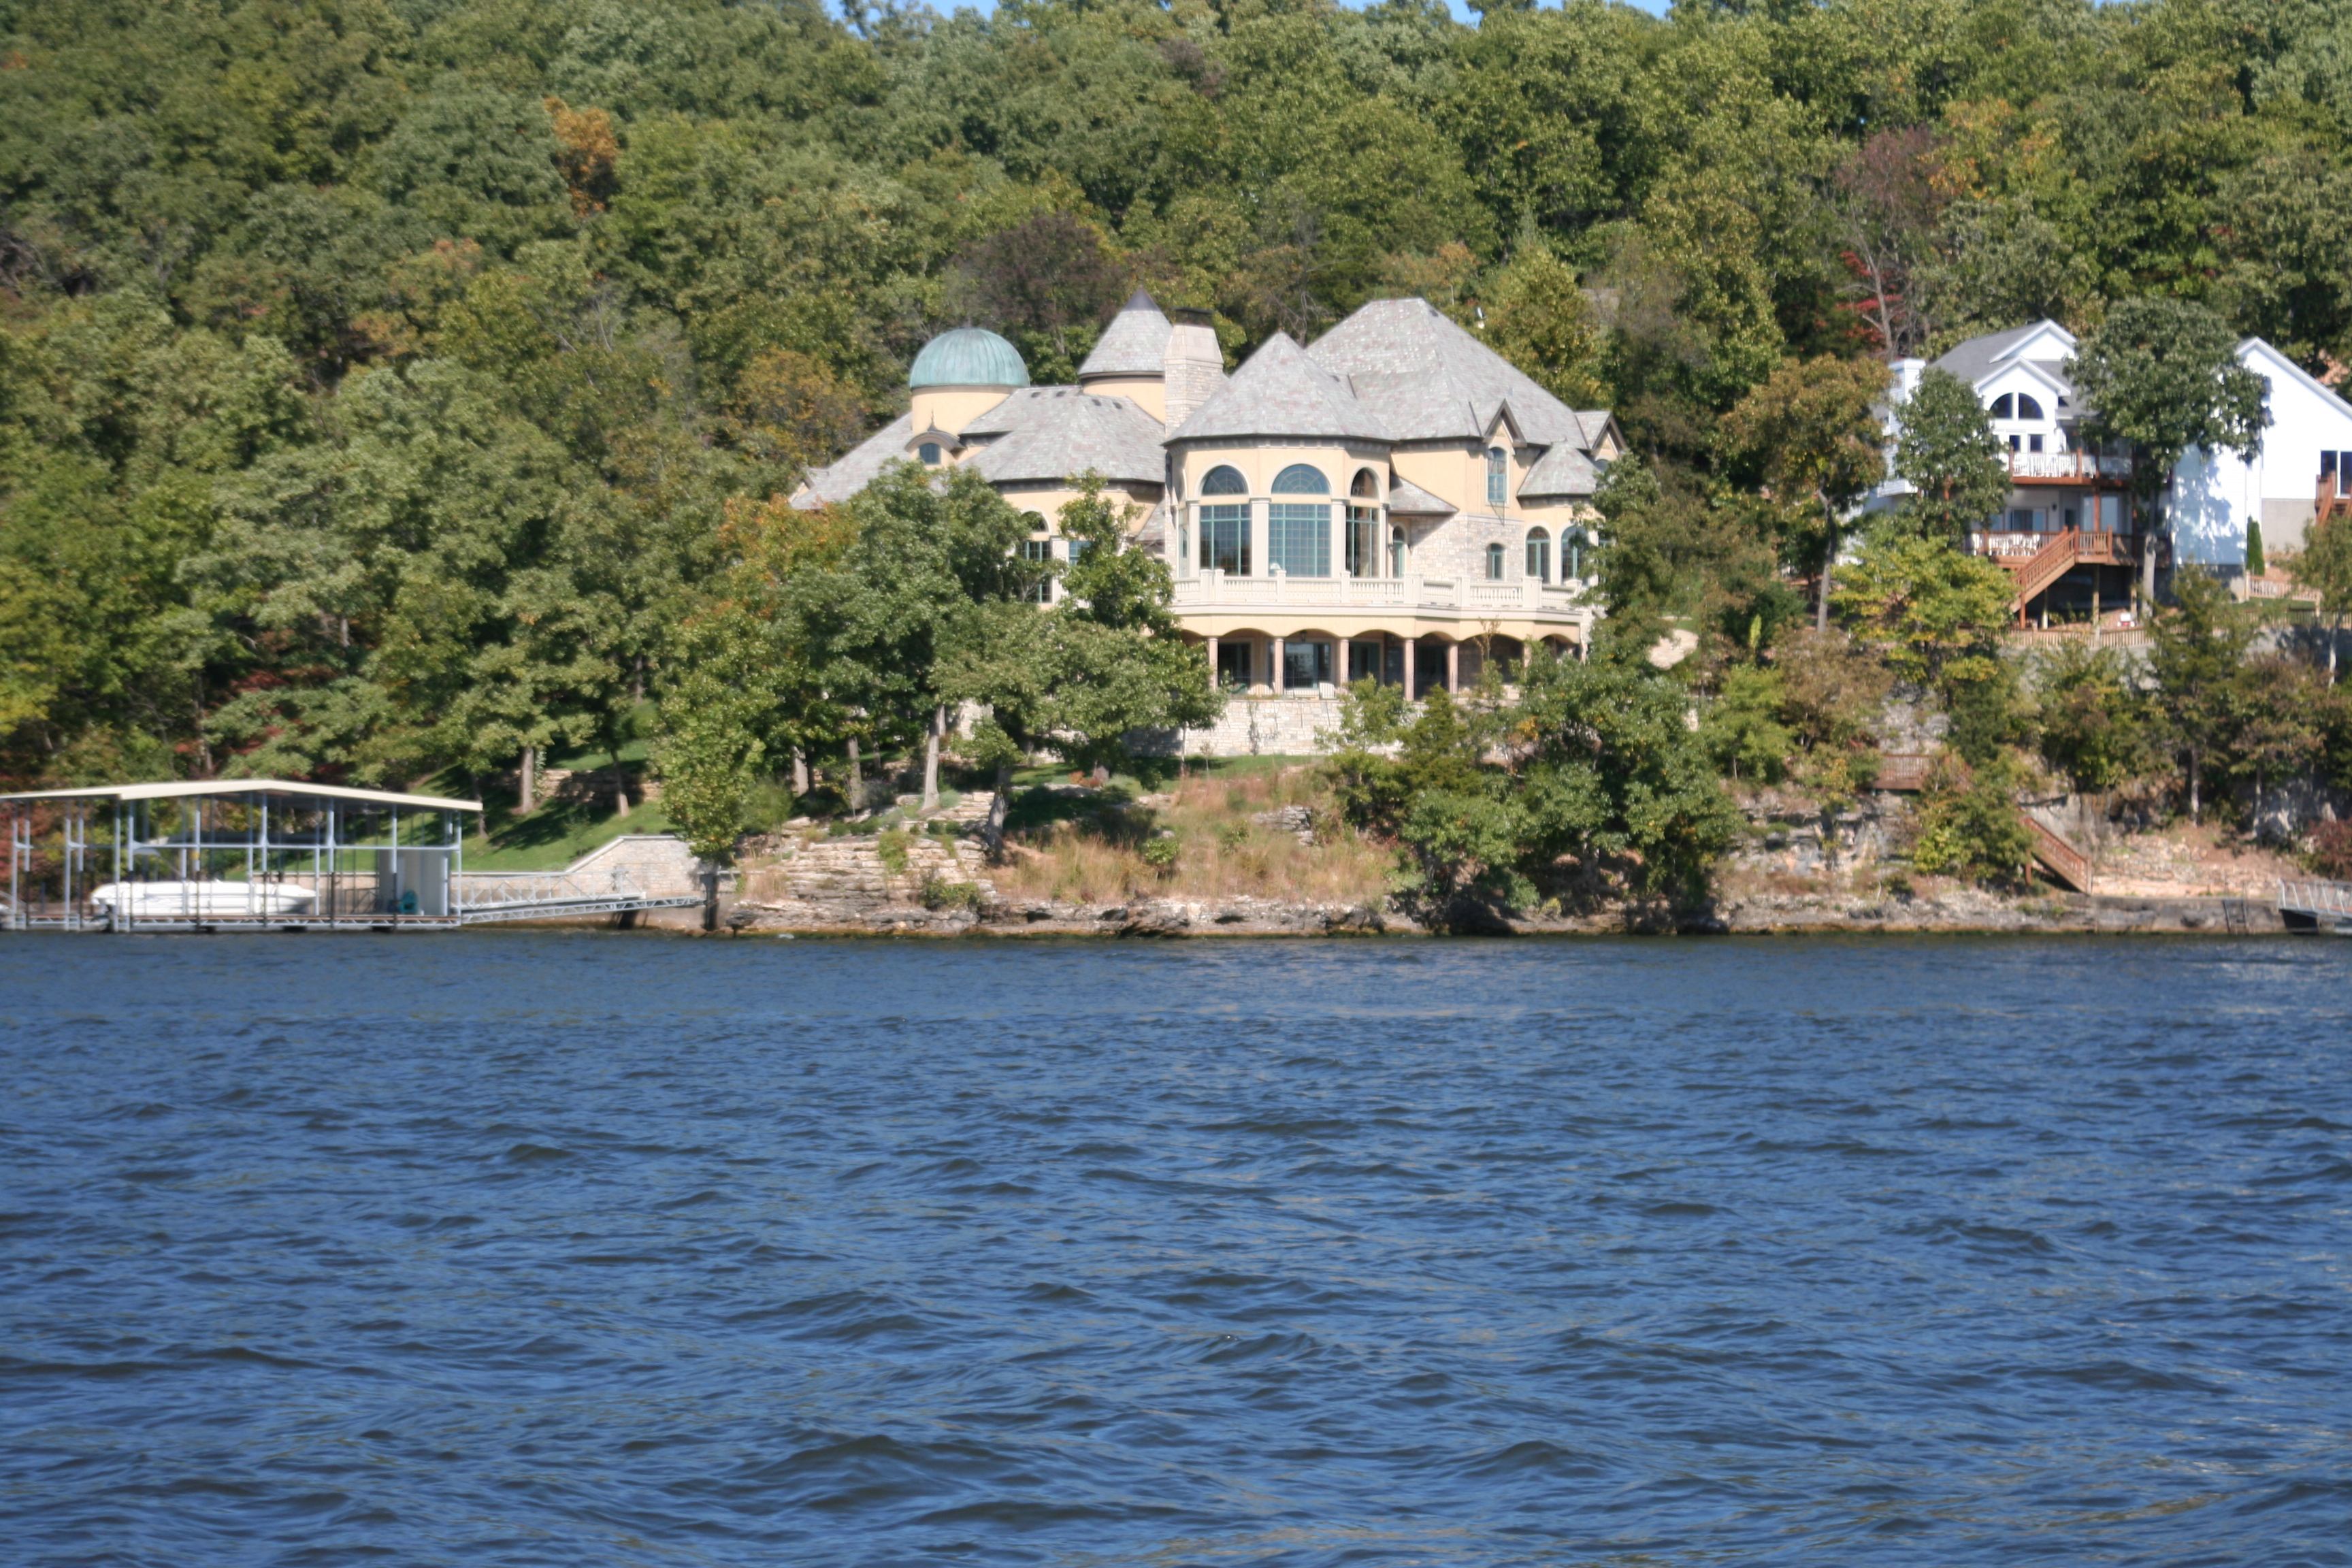 File:Lake of the Ozarks, MO Houses 05.JPG - Wikipedia